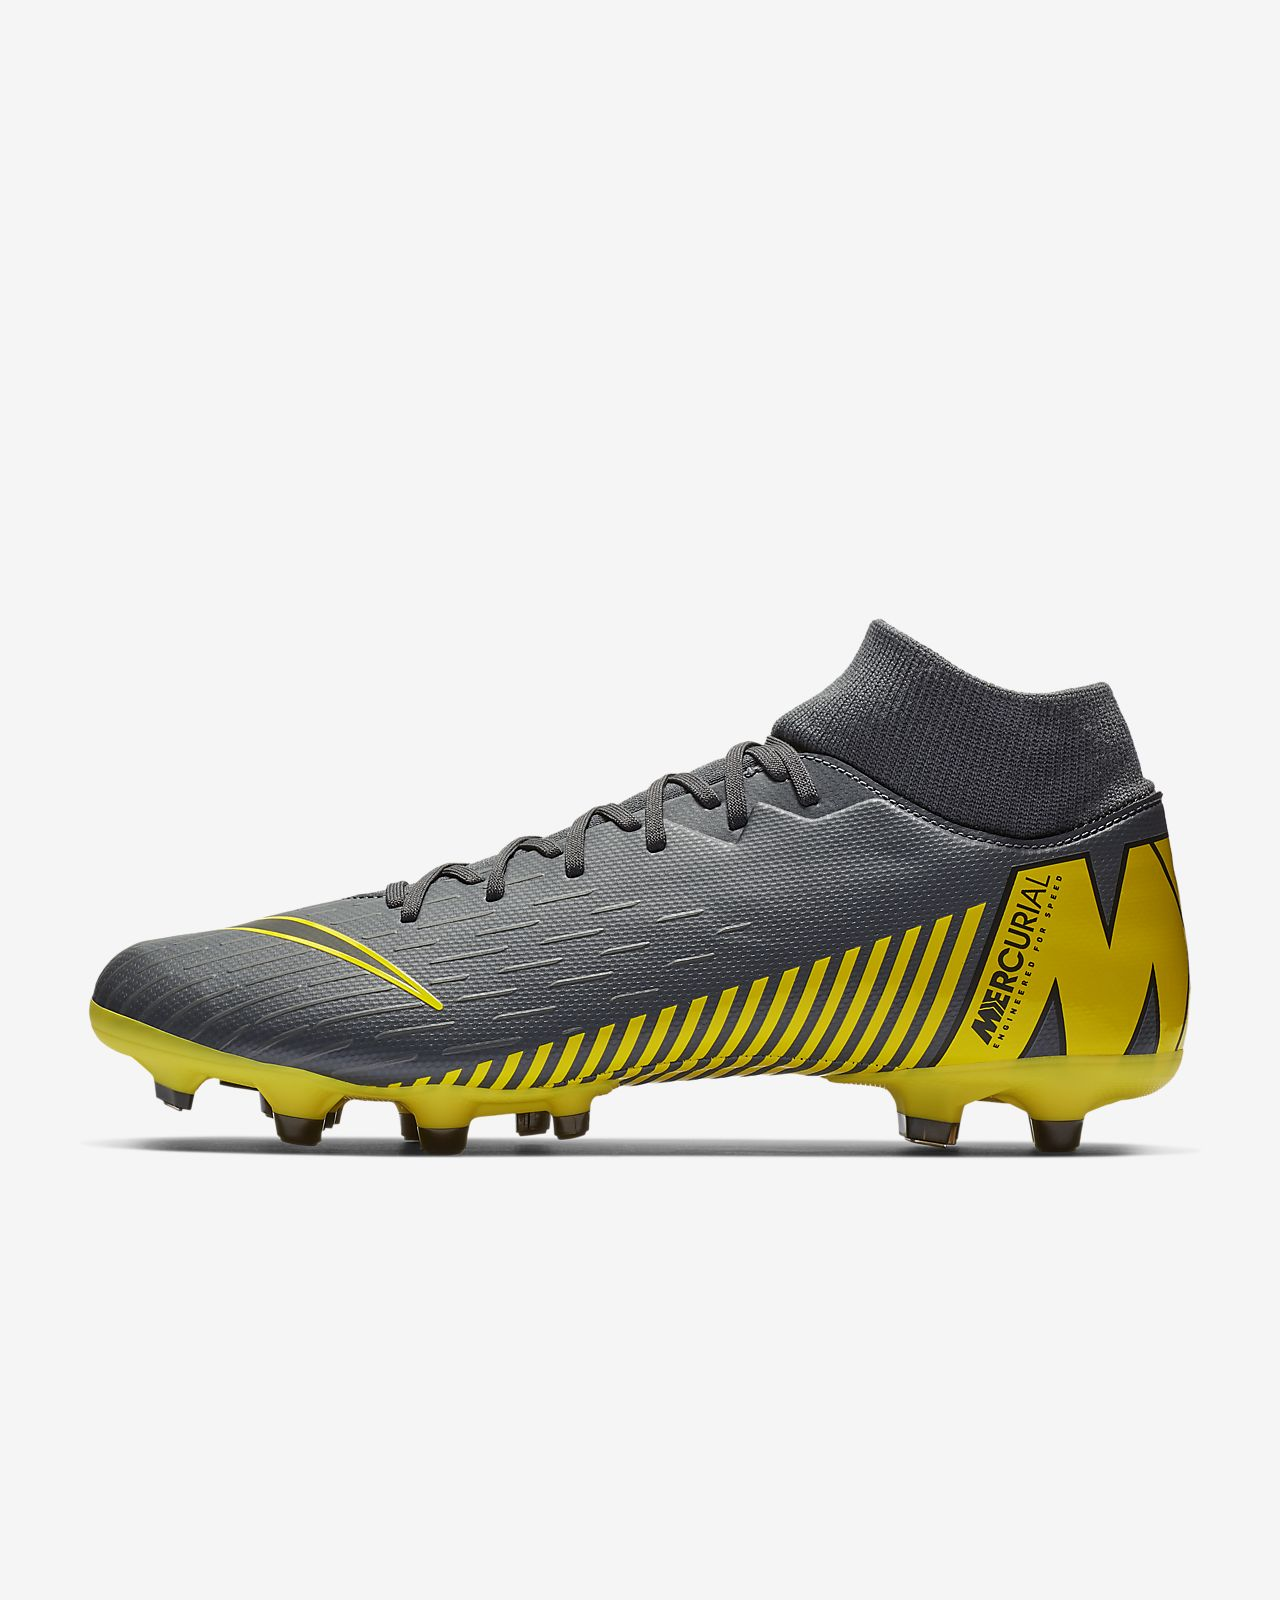 Calzado de fútbol para múltiples superficies Nike Mercurial Superfly 6 Academy MG